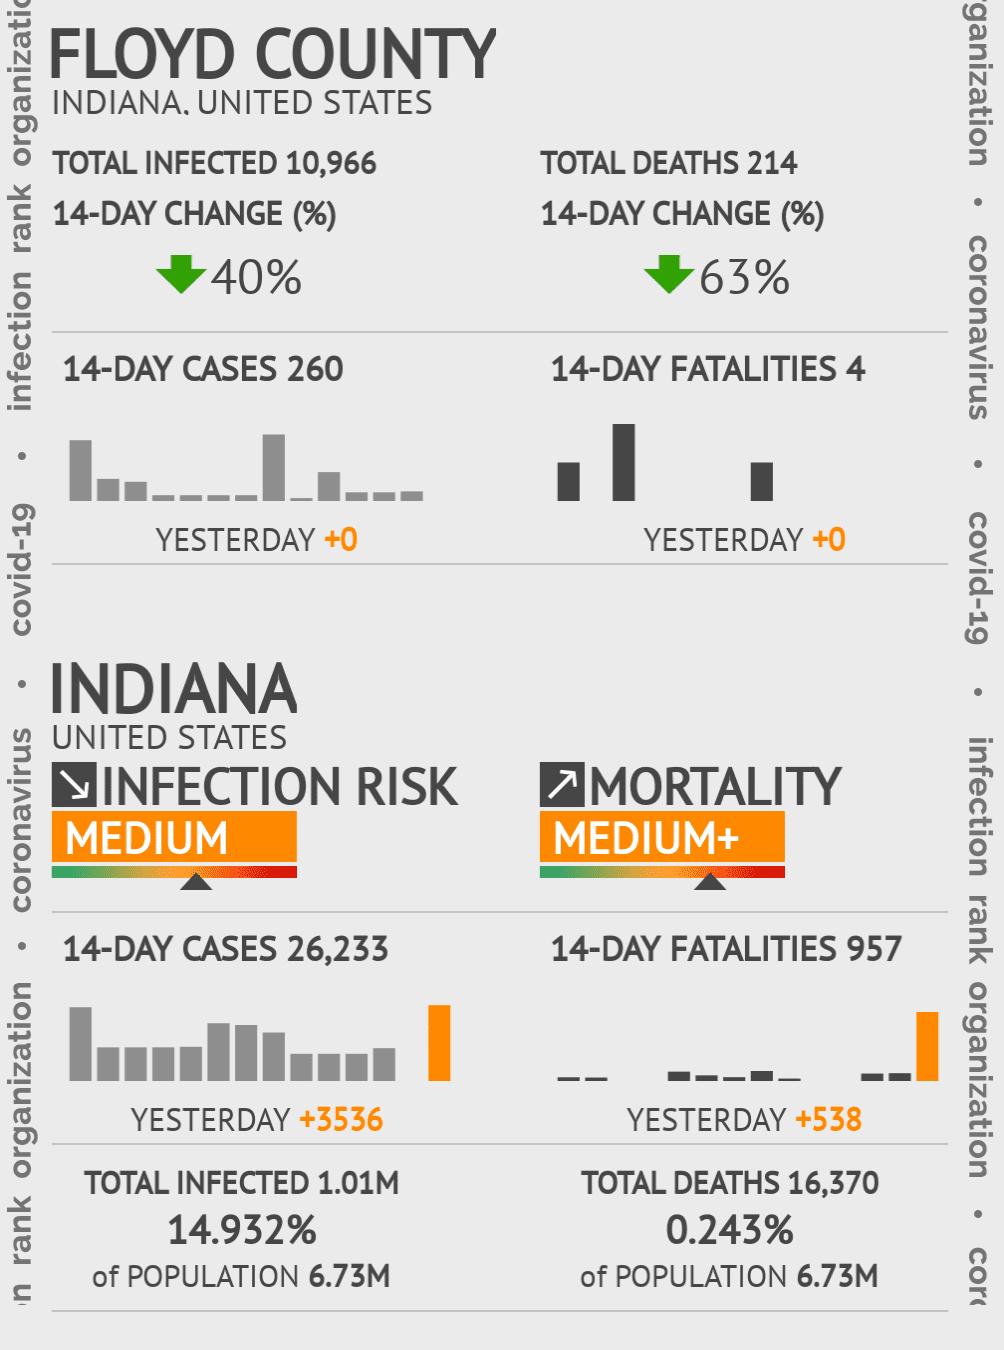 Floyd County Coronavirus Covid-19 Risk of Infection on February 25, 2021